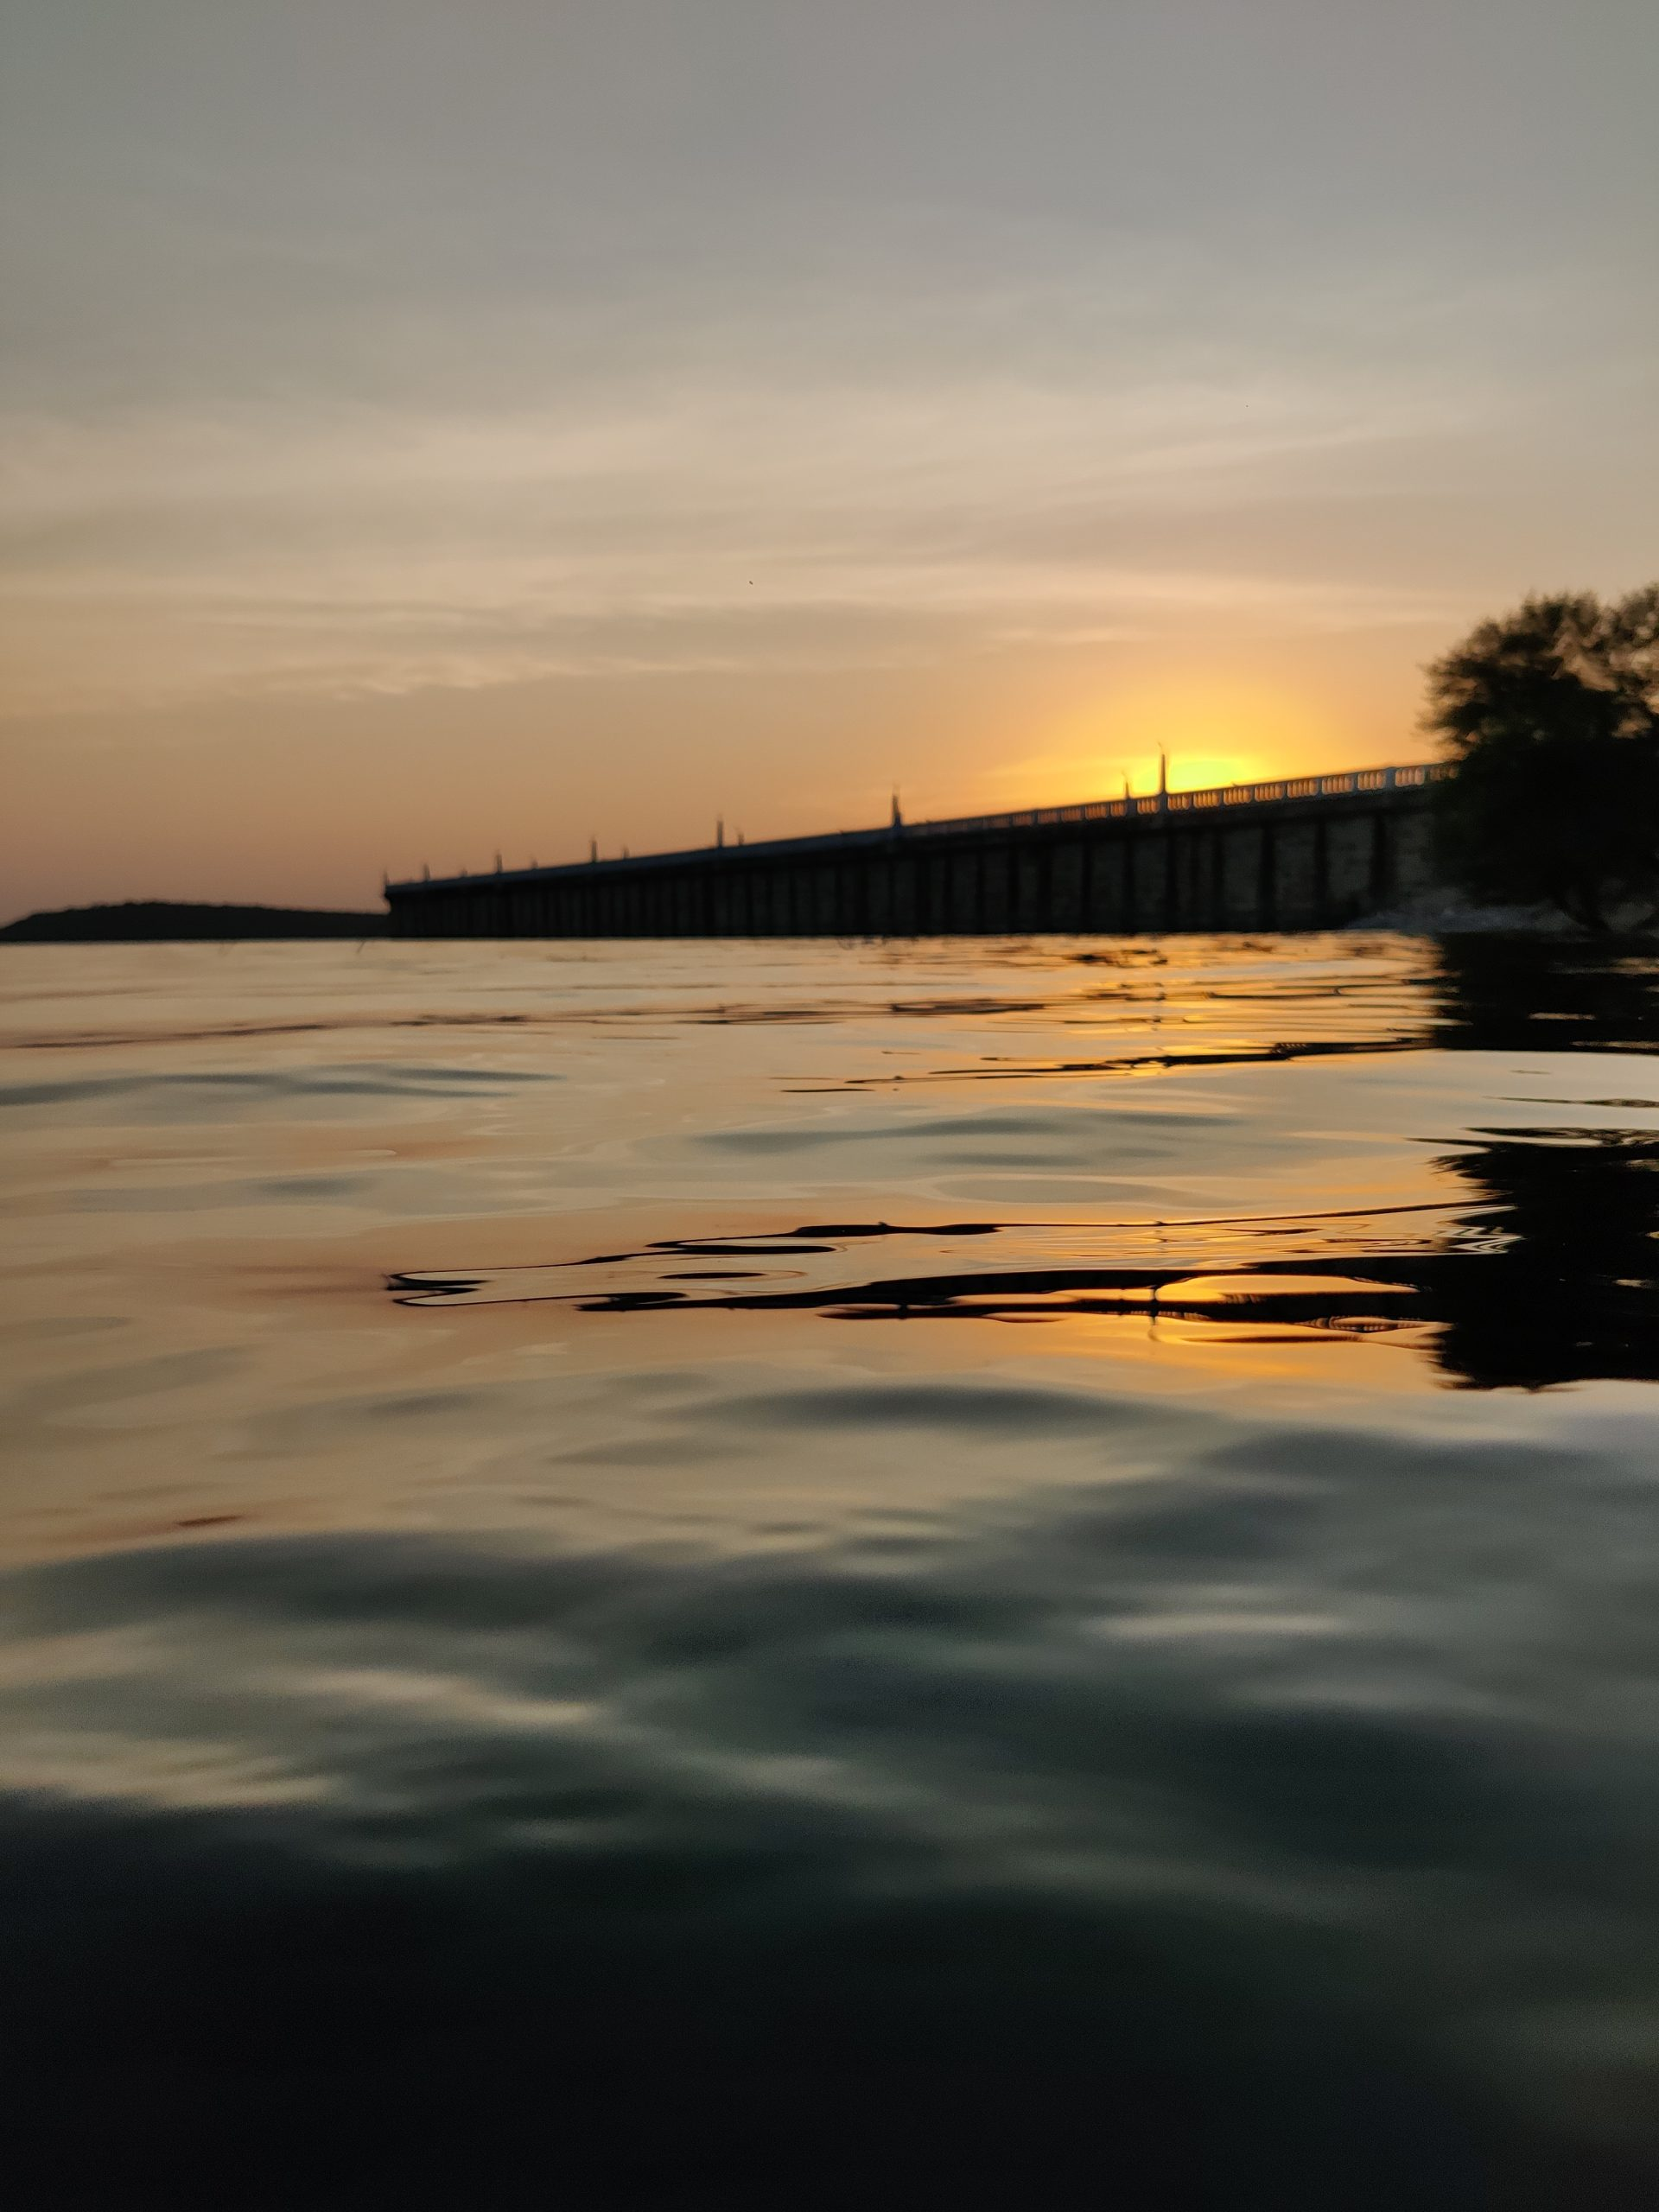 sunset at a dam